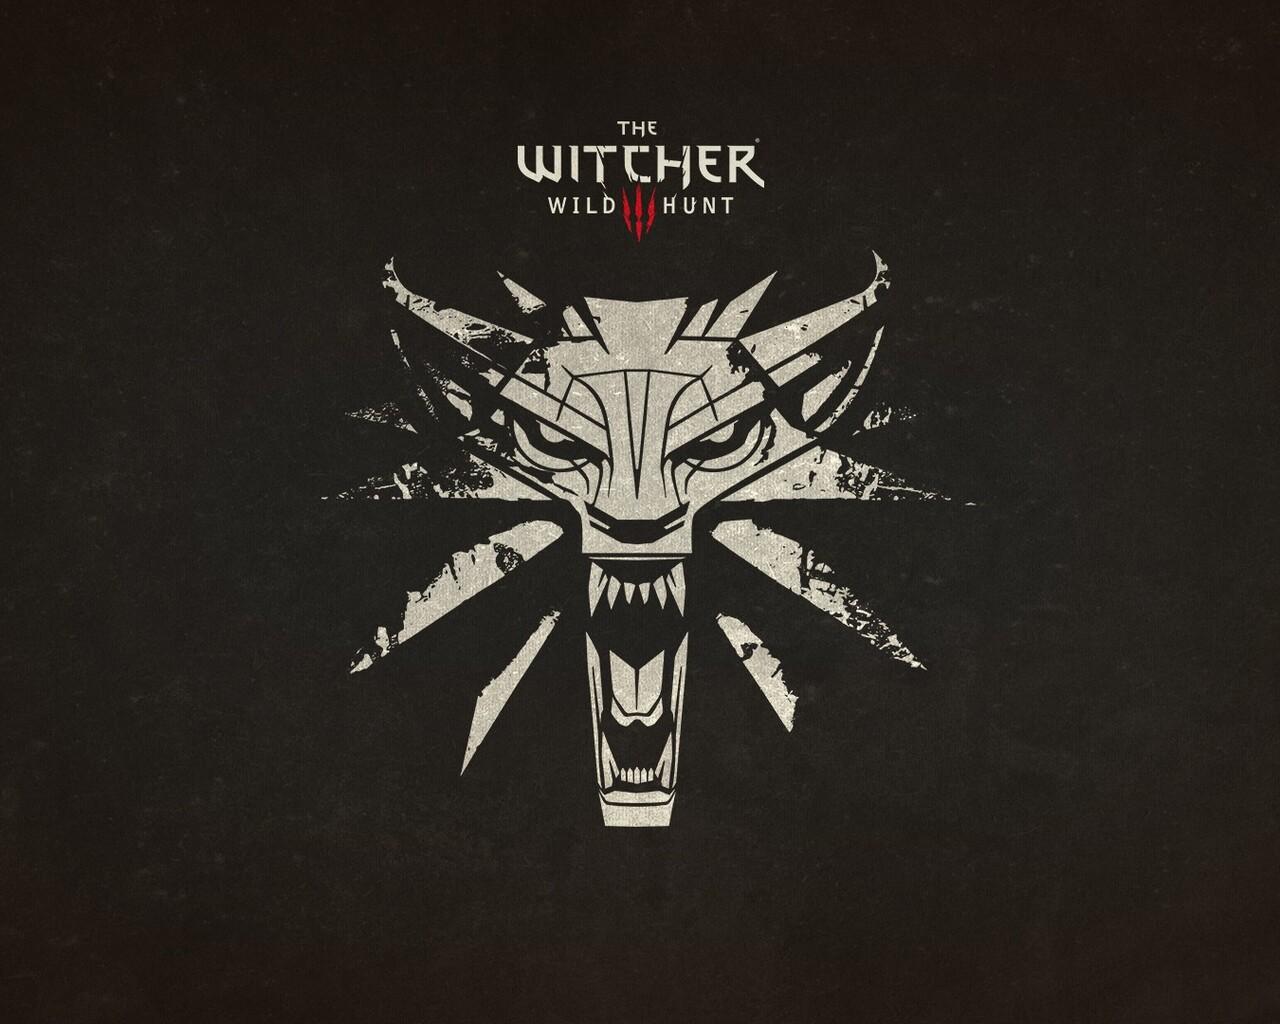 the-witcher-3-wild-hunt-logo-4k.jpg